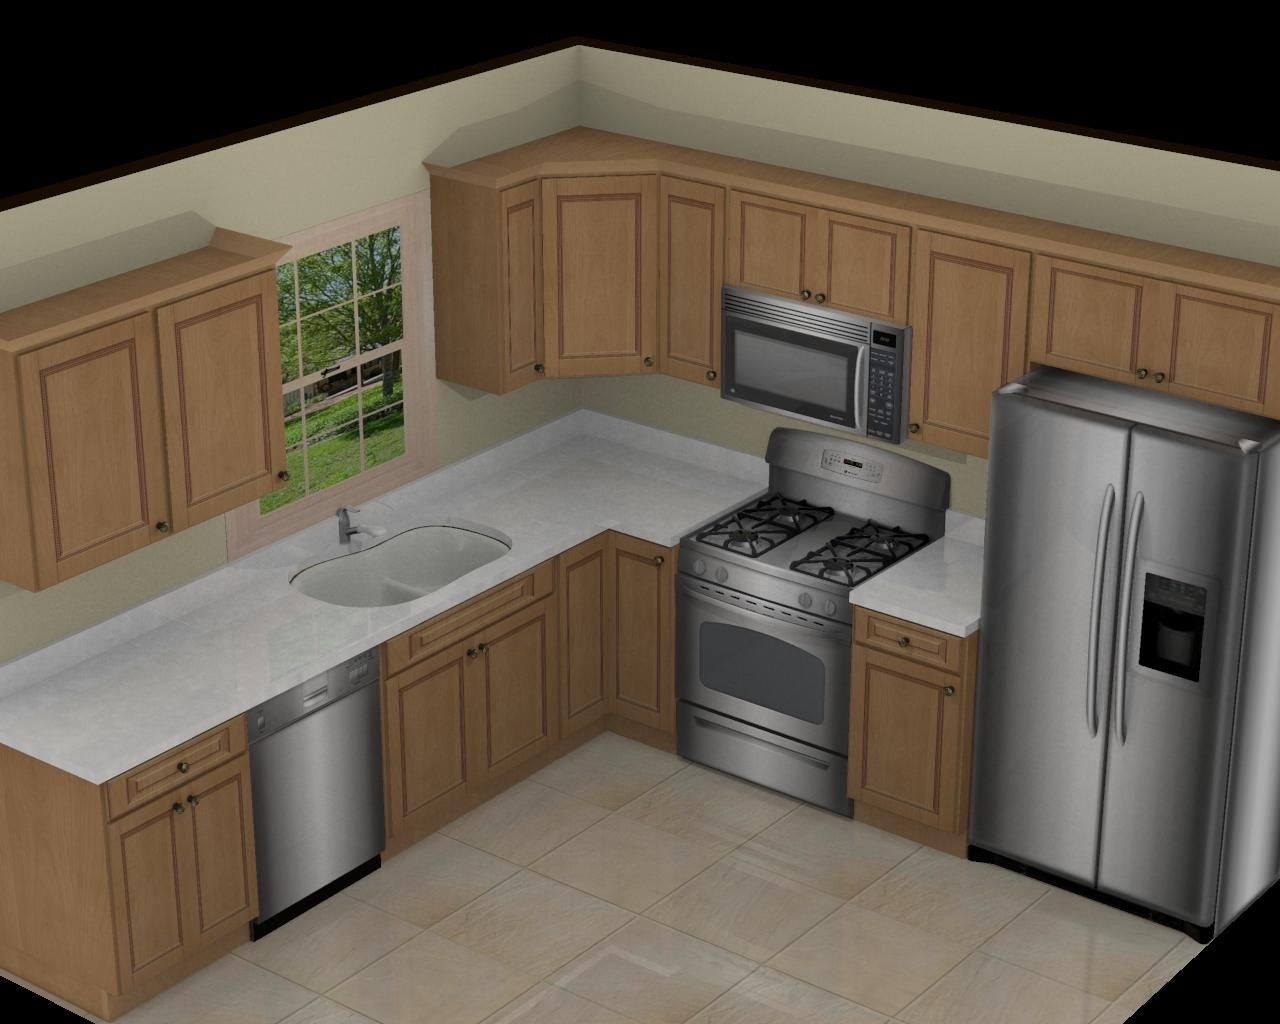 10x10 kitchen design ikea sales 2014 small kitchen layouts small kitchen design layout on kitchen remodel plans layout id=83305